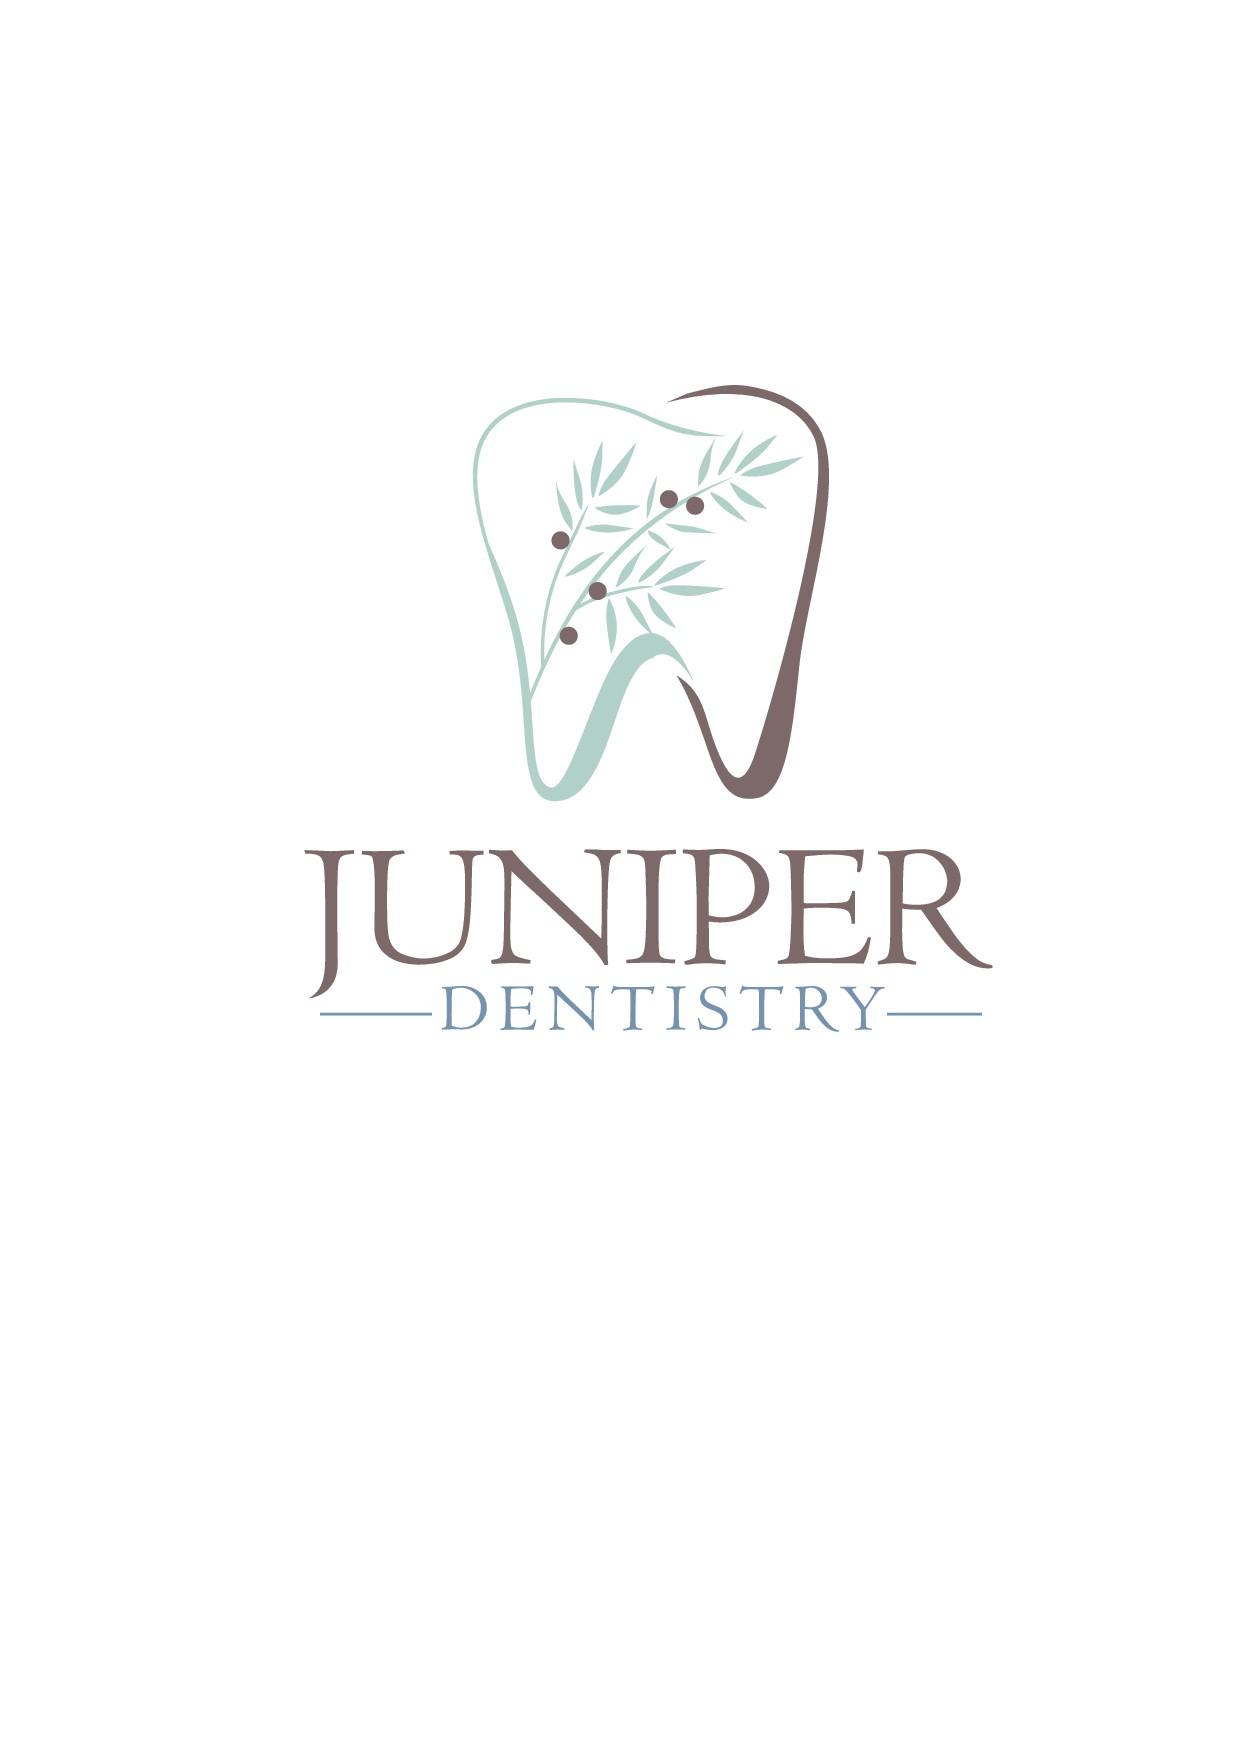 Design a logo for a high end neighborhood dental office